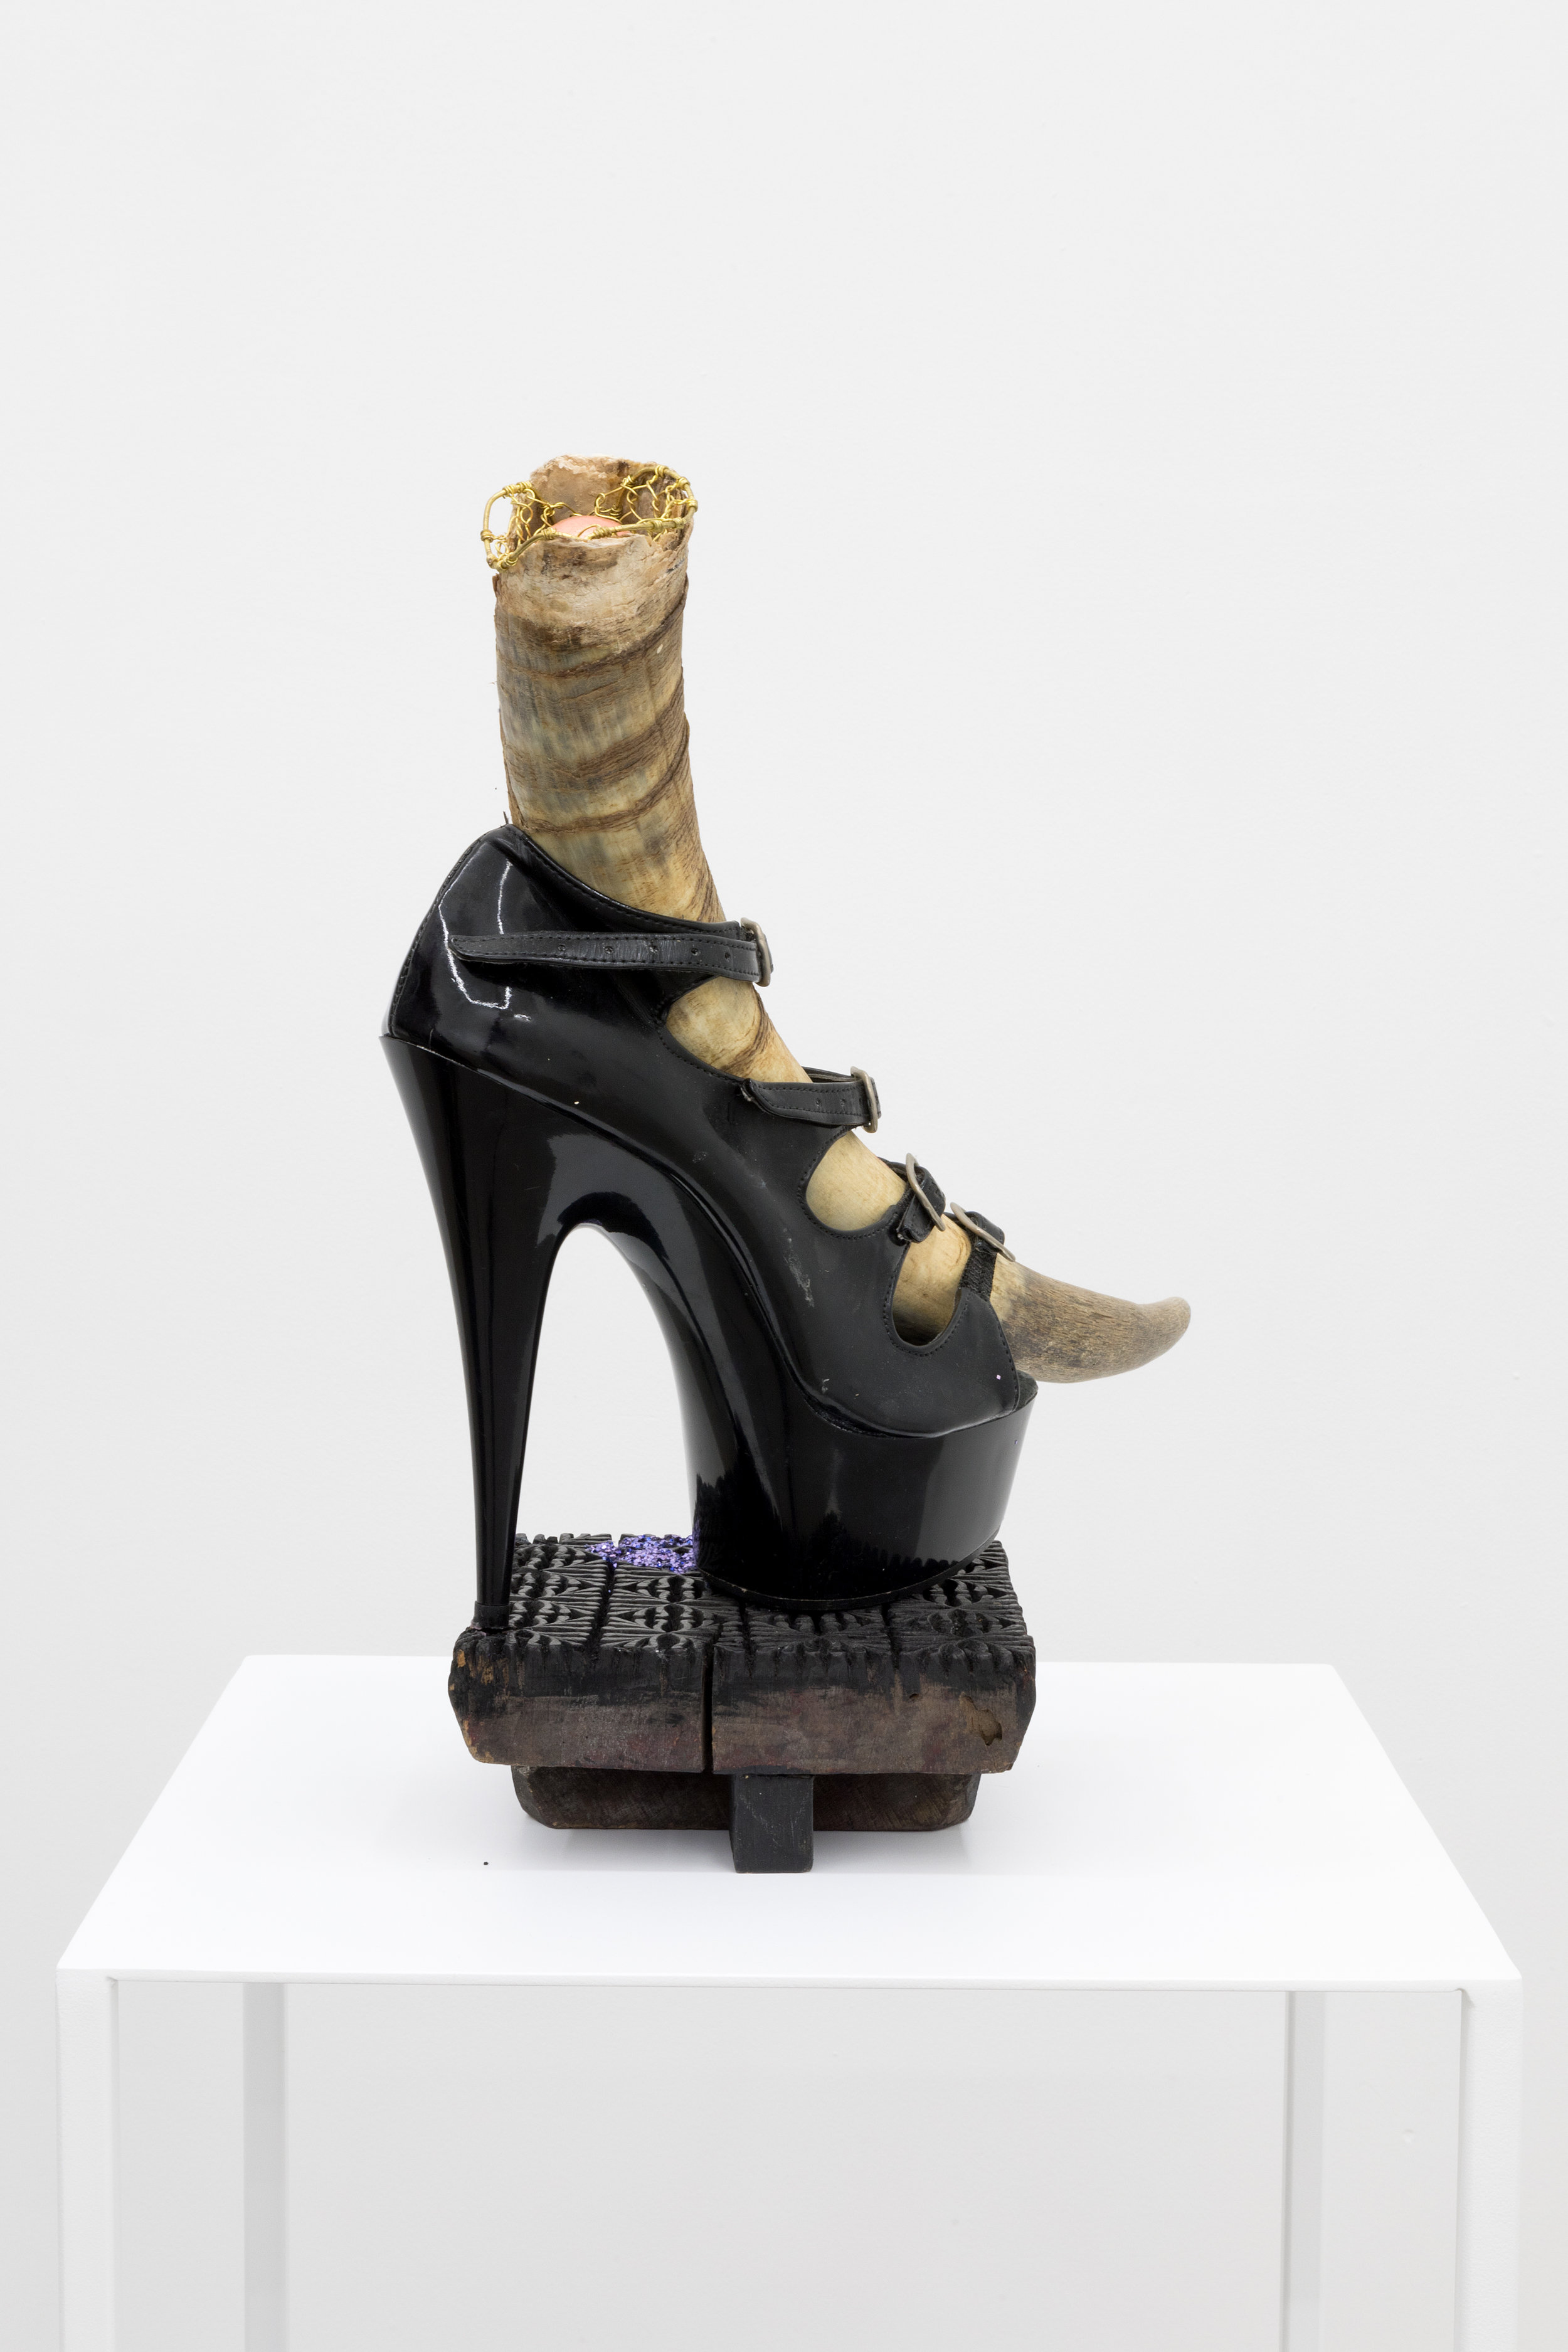 Genesis BREYER P-ORRIDGE,  Shoe Horn #4 , 2014, Ram Horn, shoe worn by Genesis as Lady Sarah, sting ray skin, ermine fur, bone, Nepalese fabric- printing square, brass netting, copper ball, 9 x 9 x 8 in